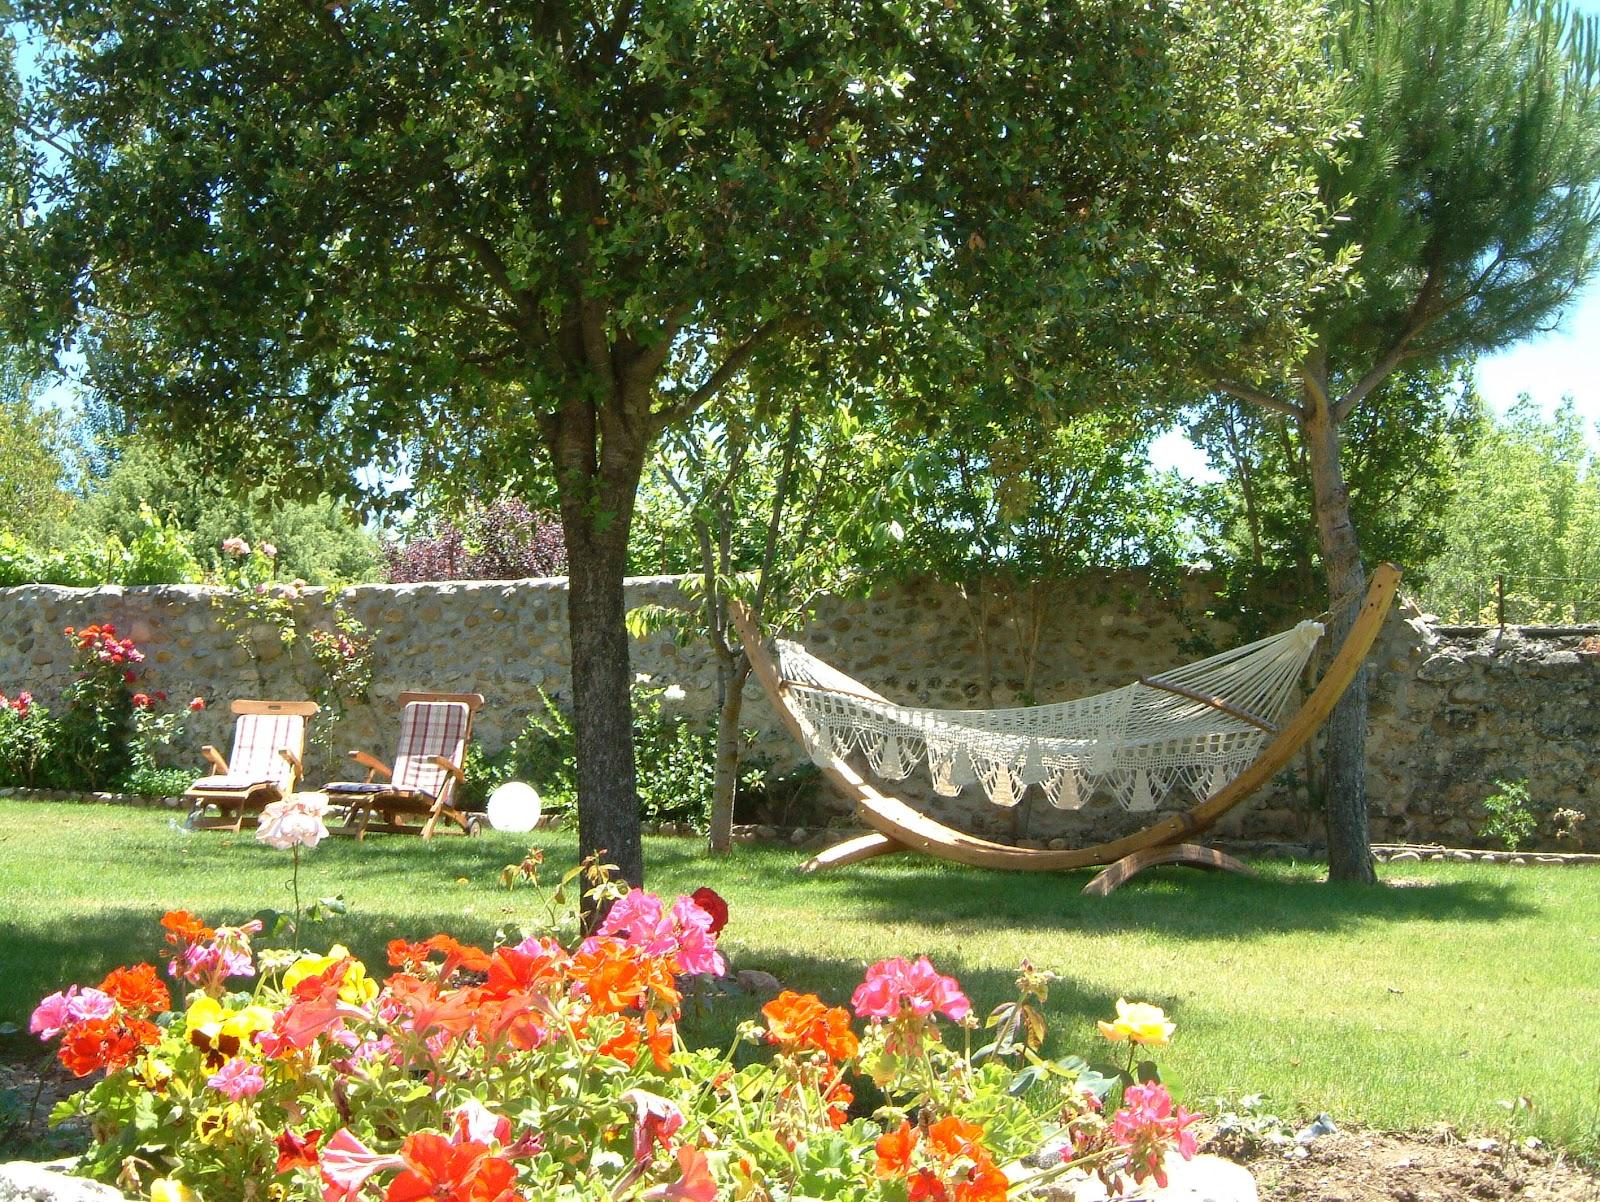 Hotel r do a sancha oferta noche alojamiento hasta 50 - Oferta tumbonas jardin ...